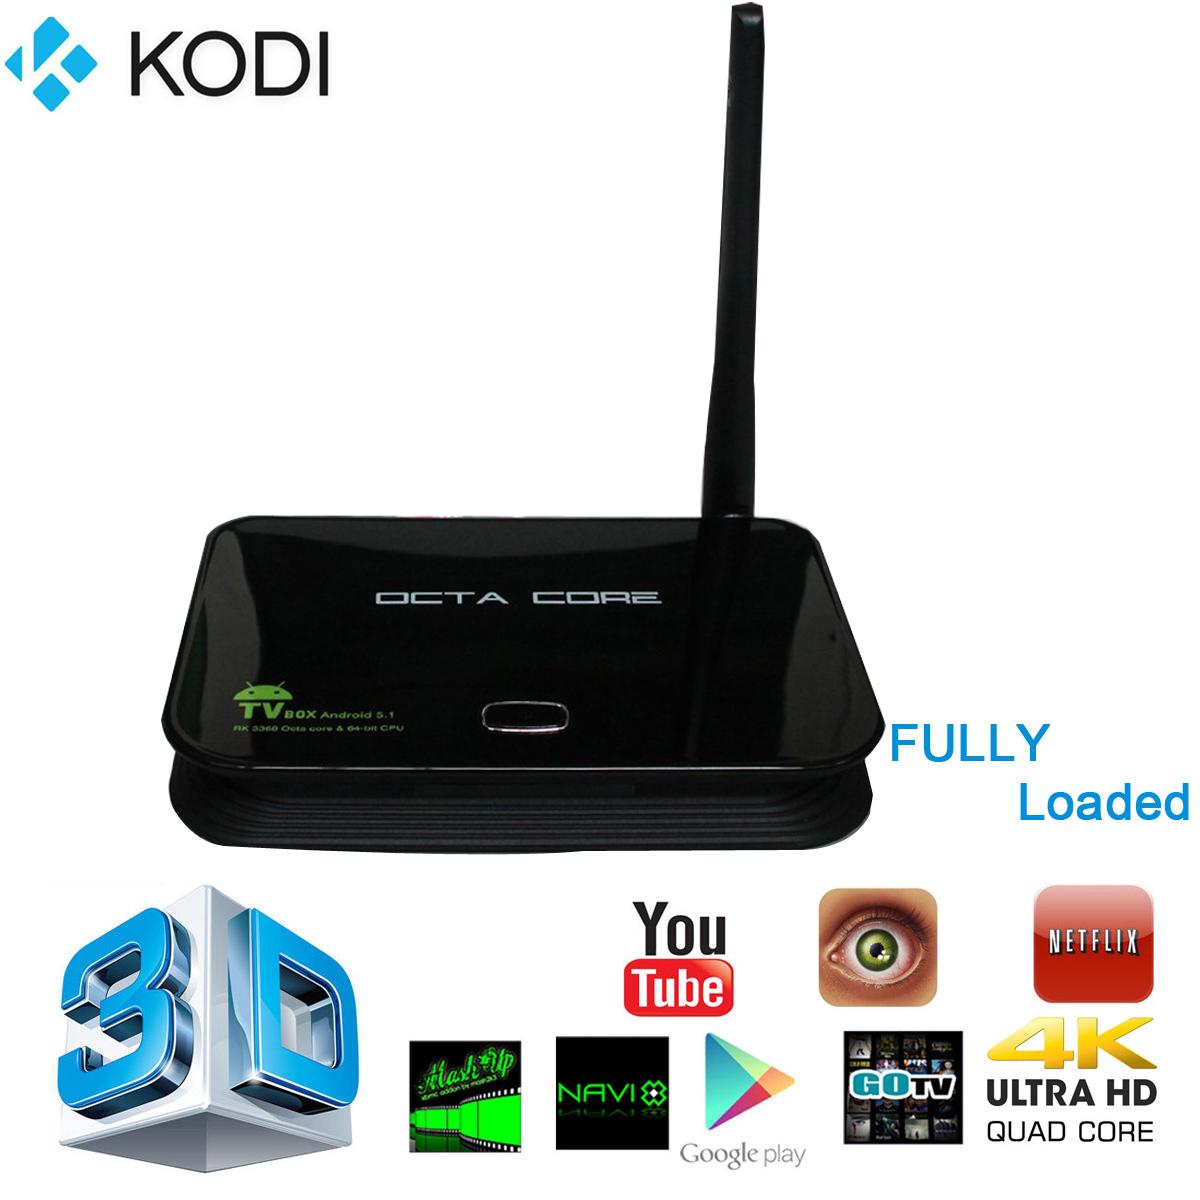 Z4 RK3368 Octa Core KODI Android 5.1 TV Box Wifi Lan 64Bit Bluetooth XBMC Set Top Smart Media Player 2GB/16GB UK AH099(China (Mainland))